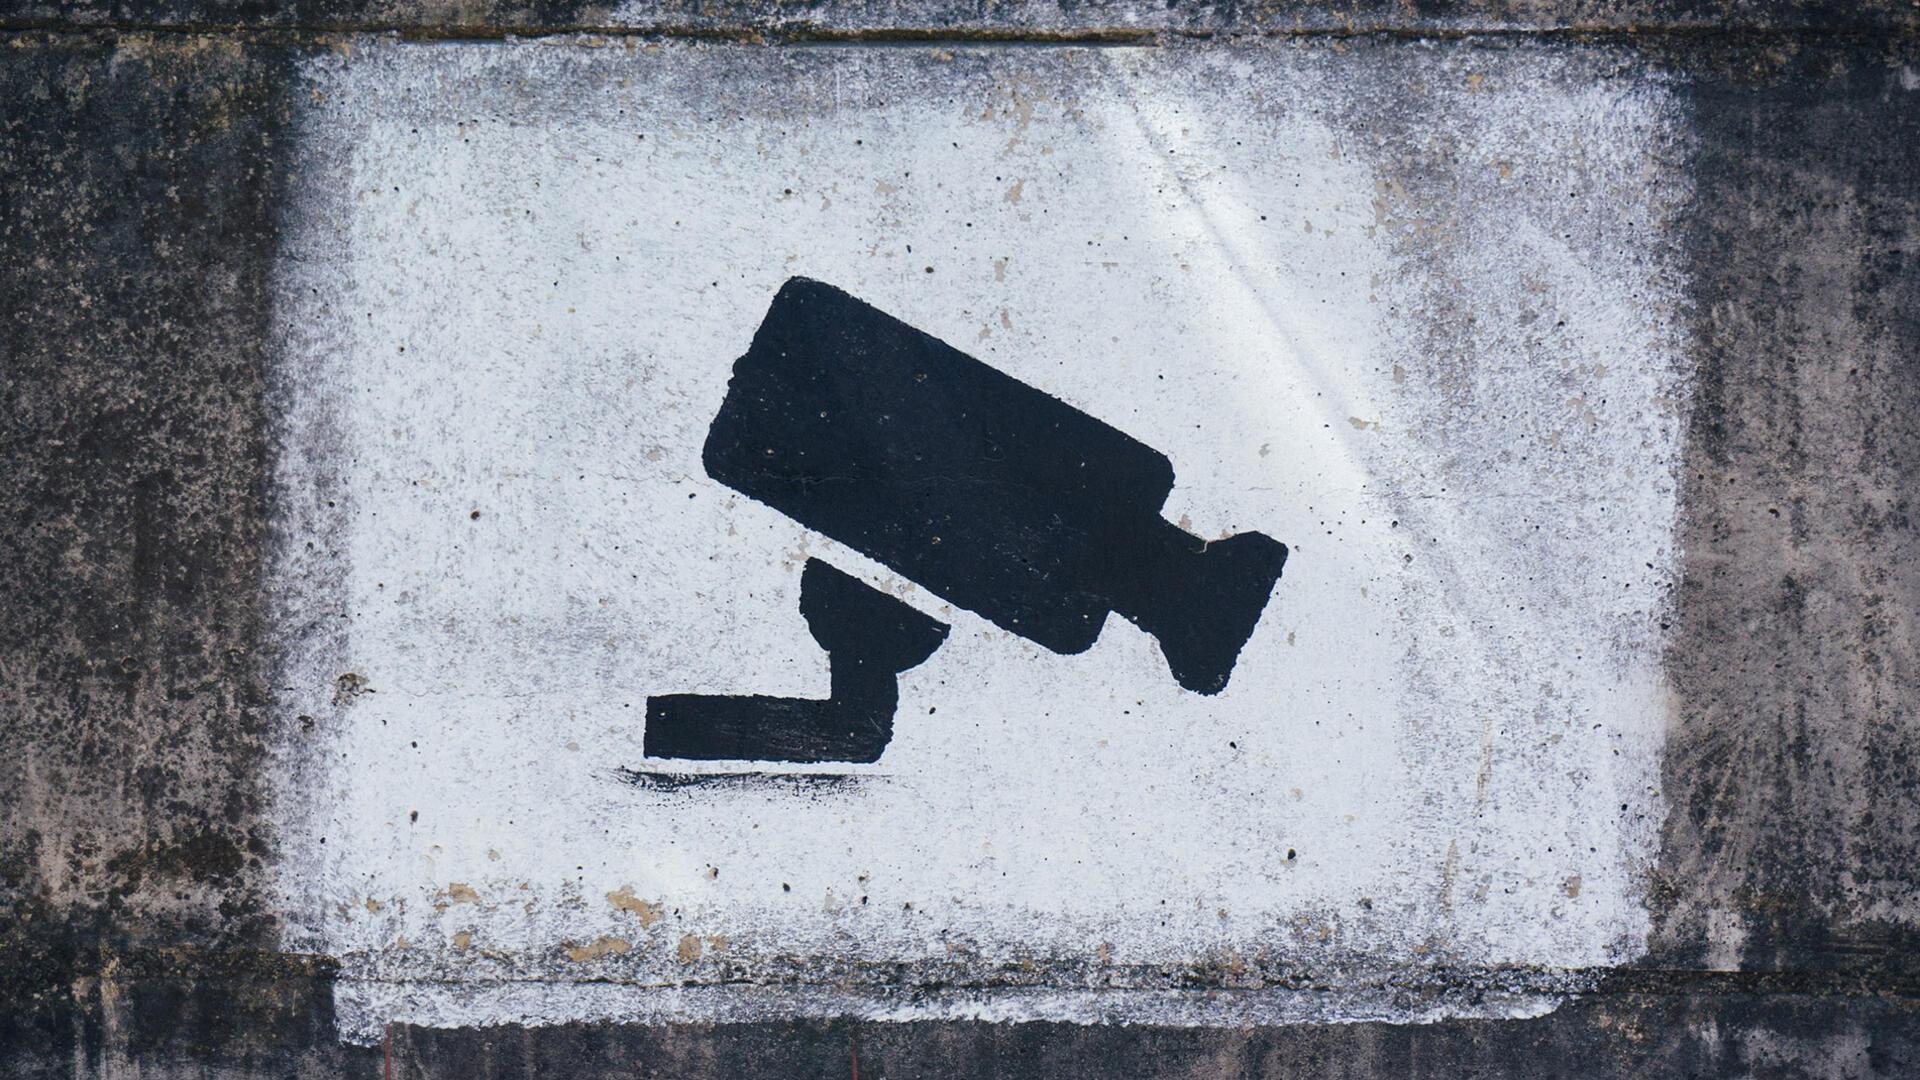 Spraypainted surveillance camera